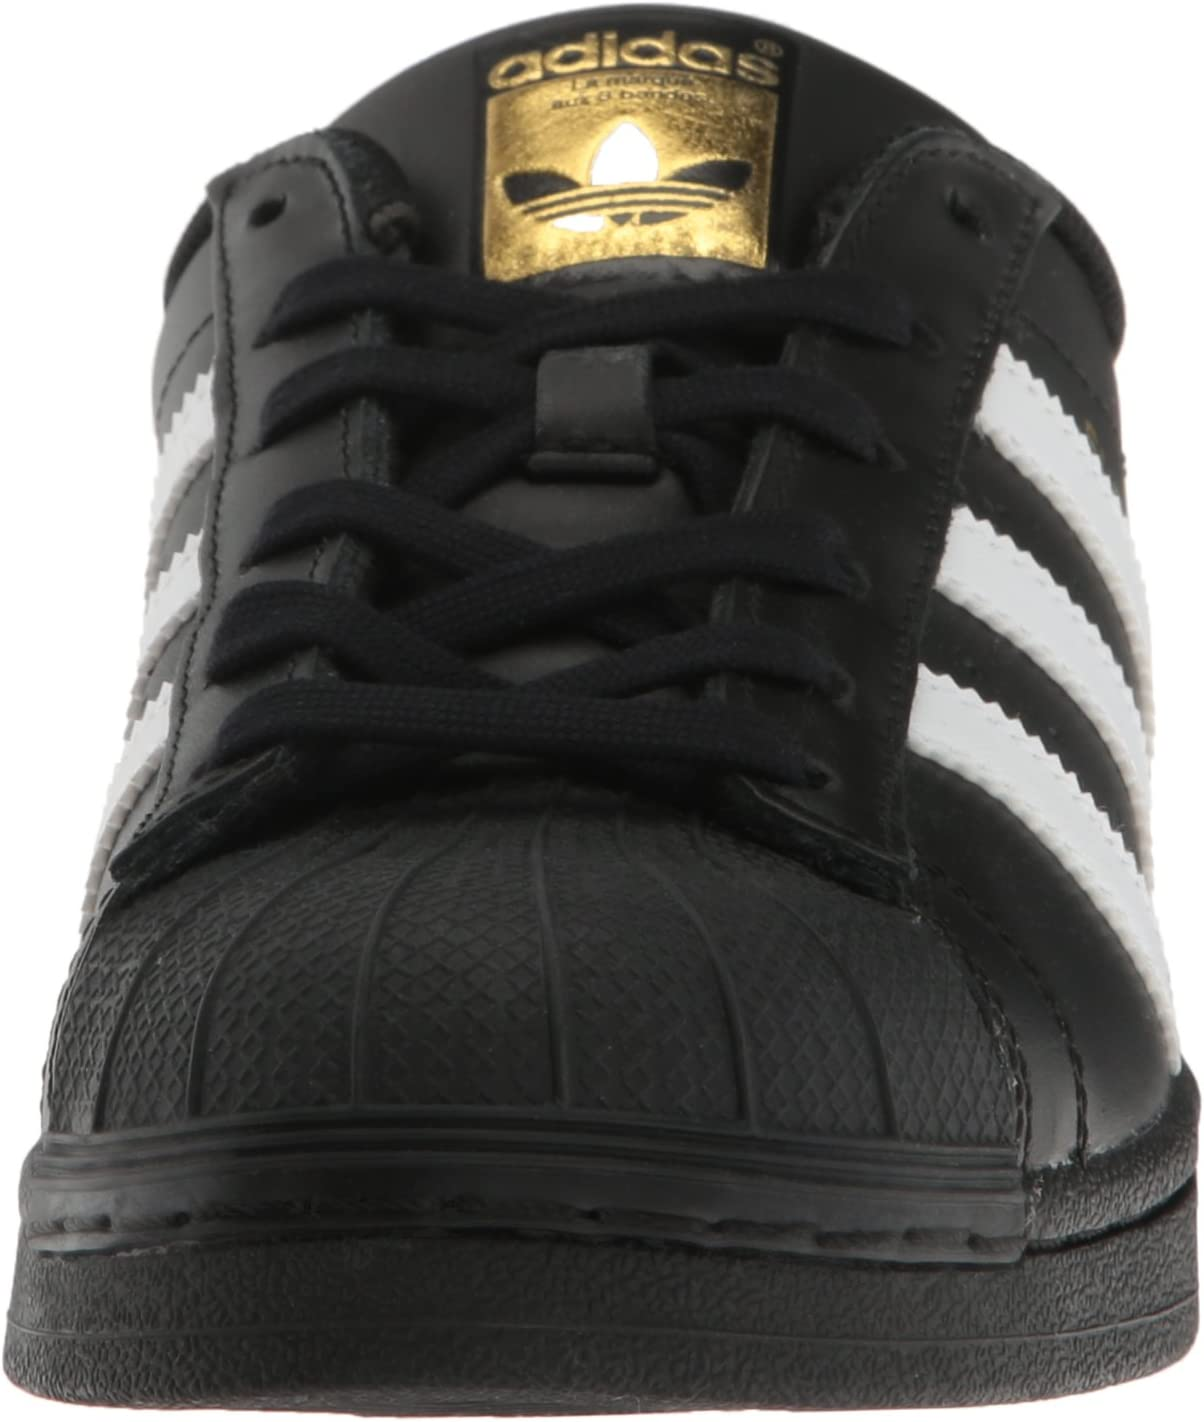 adidas Men's Superstar Trainers Black/White/Metallic/Gold